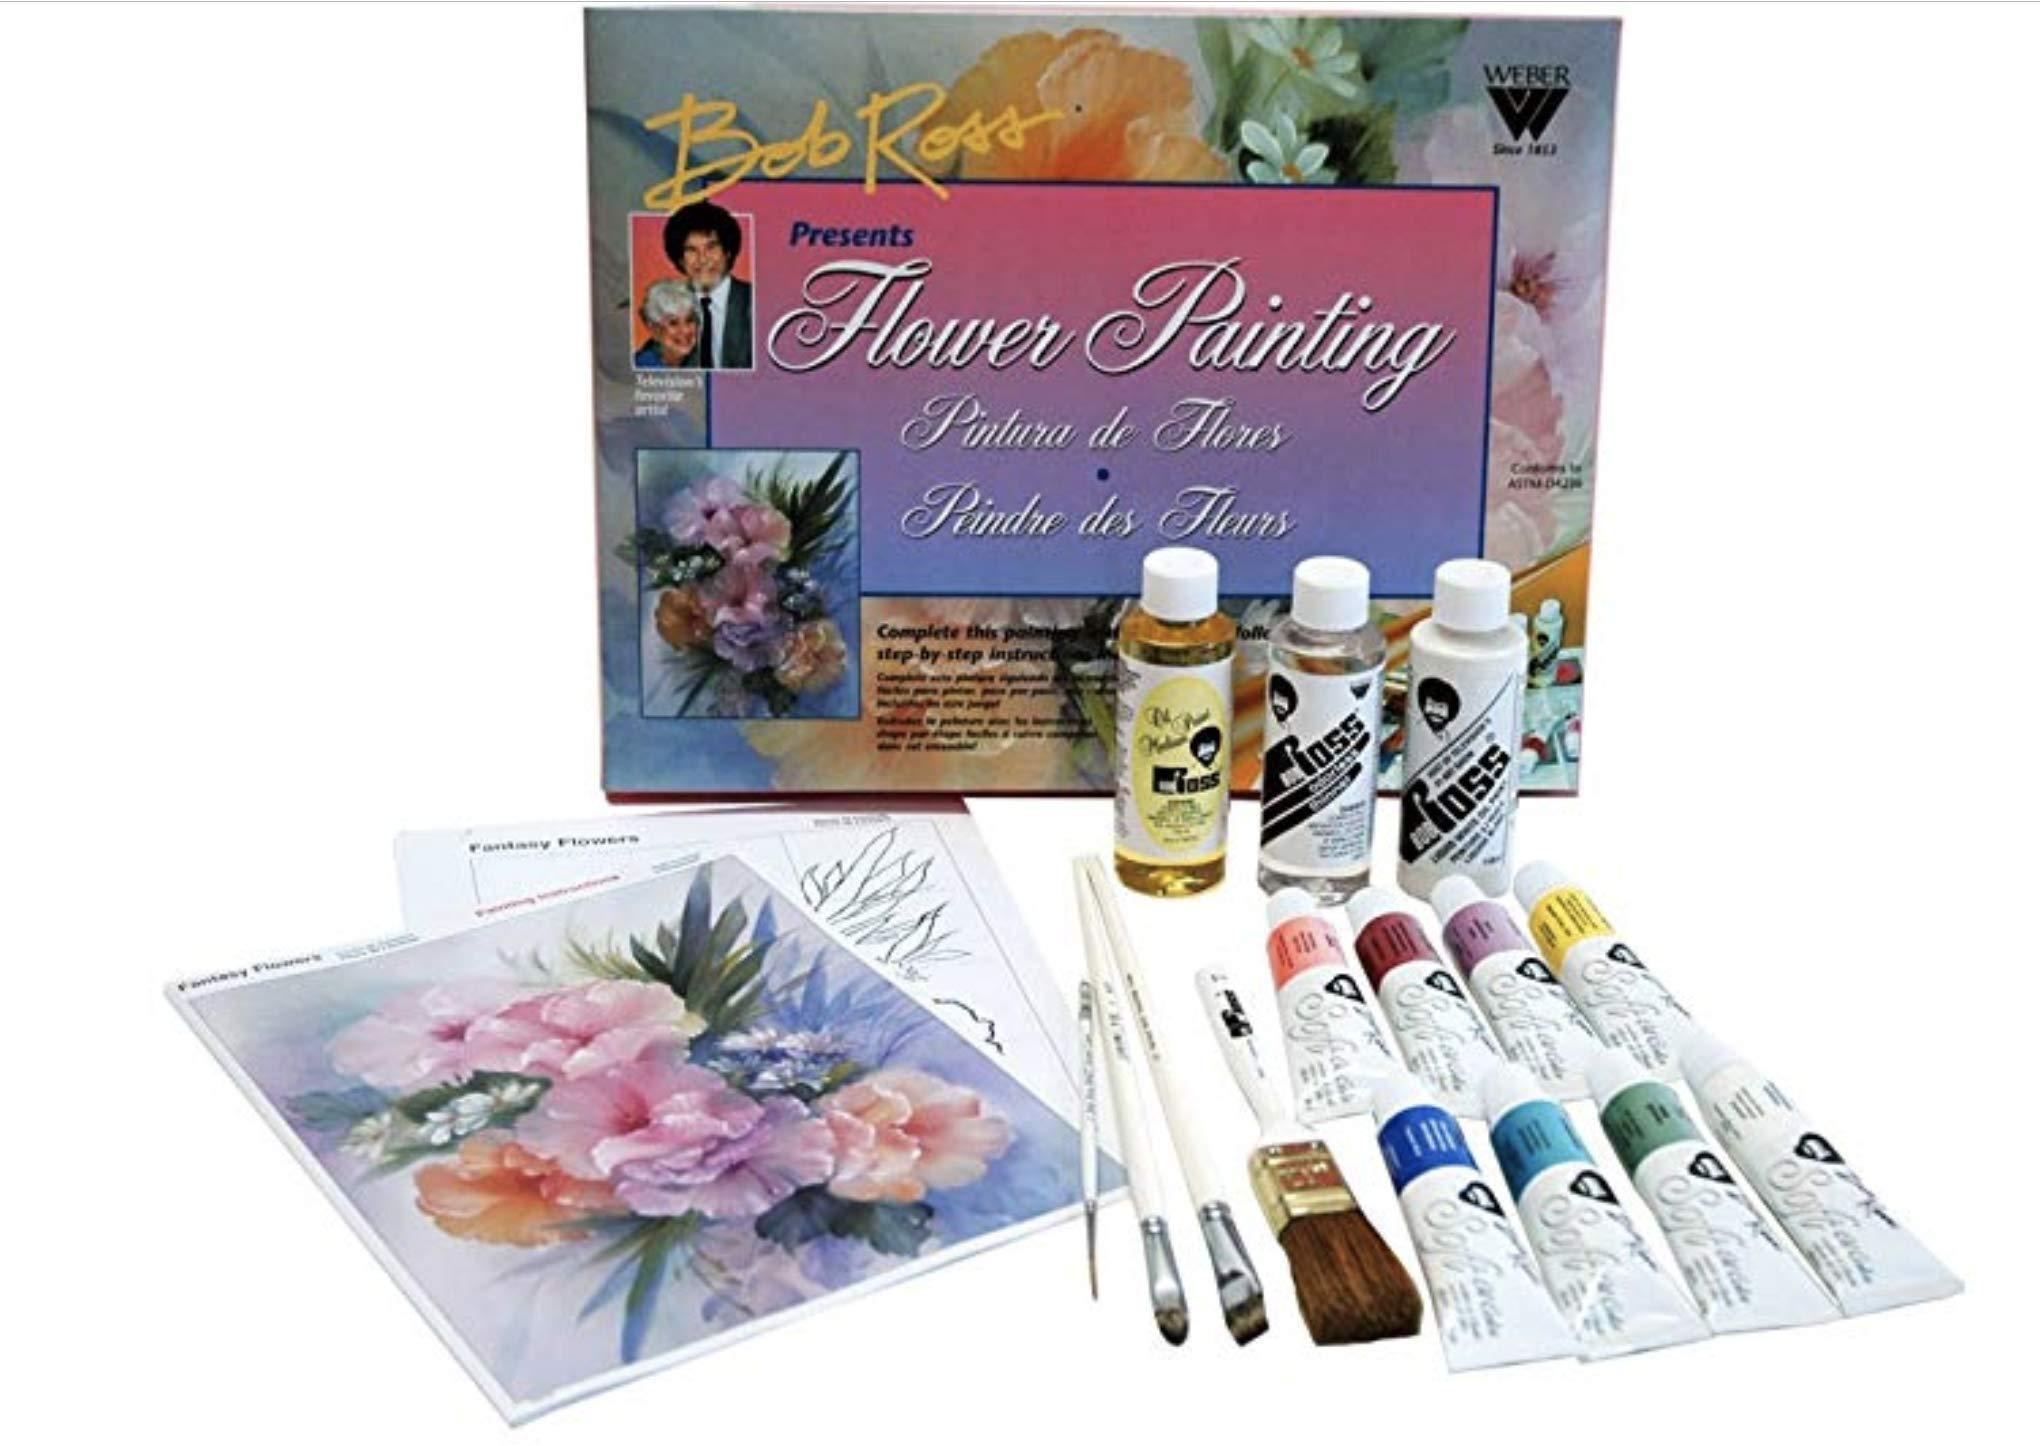 Bob Ross R6470 Floral Painting Set